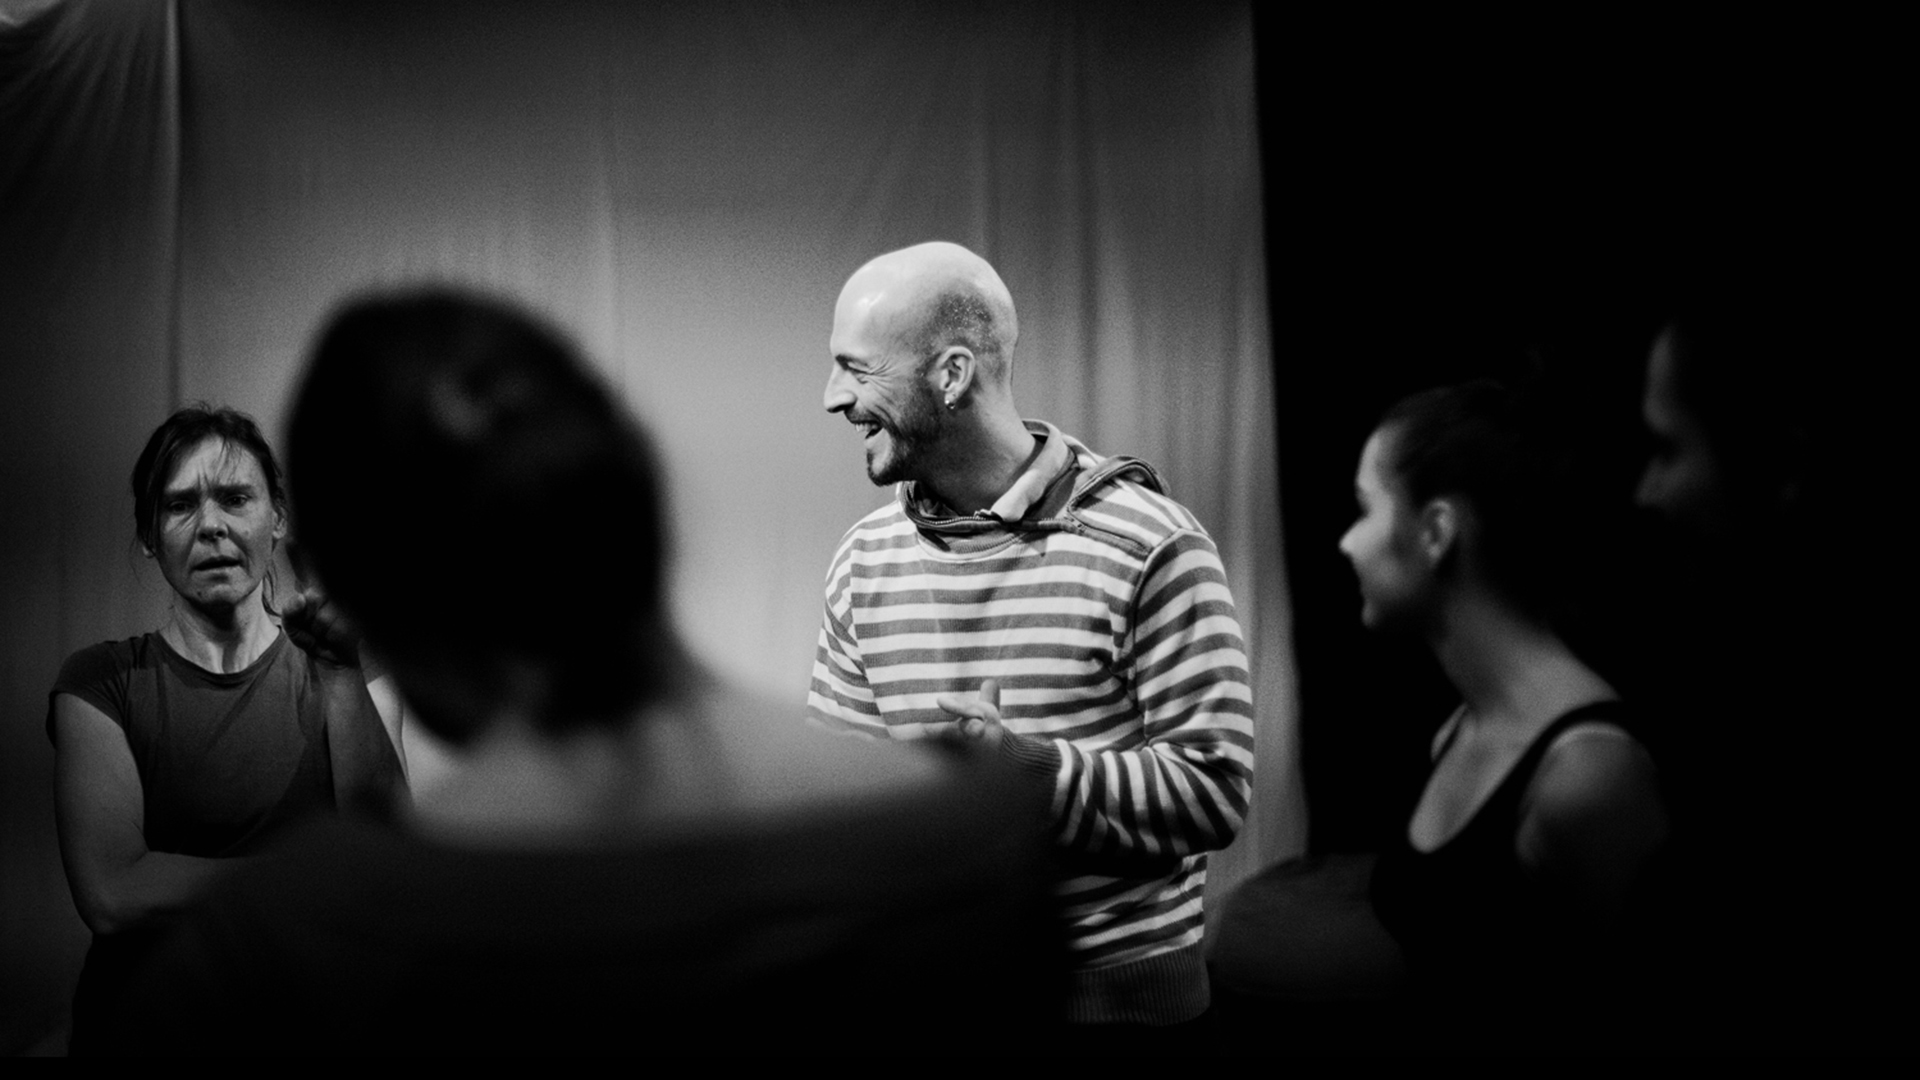 Matthias-Markstein-Kooperationen-Mondstaub-Körper-Choreografie-Probe-Foto-Franziska-Barth